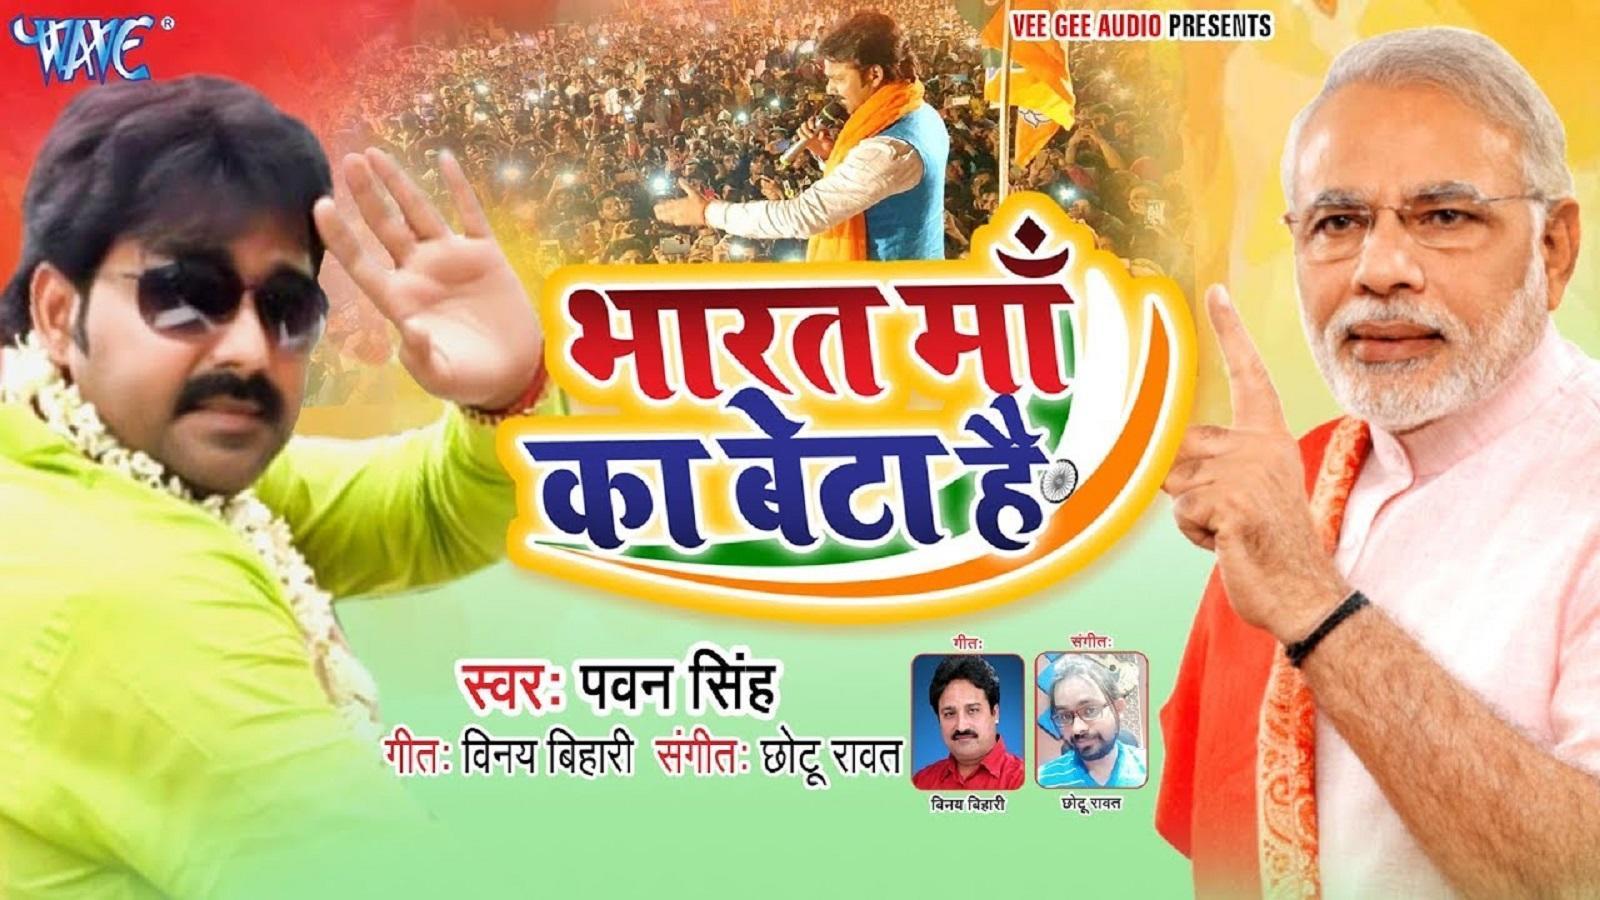 Naya Bhojpuri Gana Video Song Latest Bhojpuri Song Bharat Maa Ka Beta Hai Sung By Pawan Singh To Celebrate Bjp S Landslide Victory In Lok Sabha Elections 2019